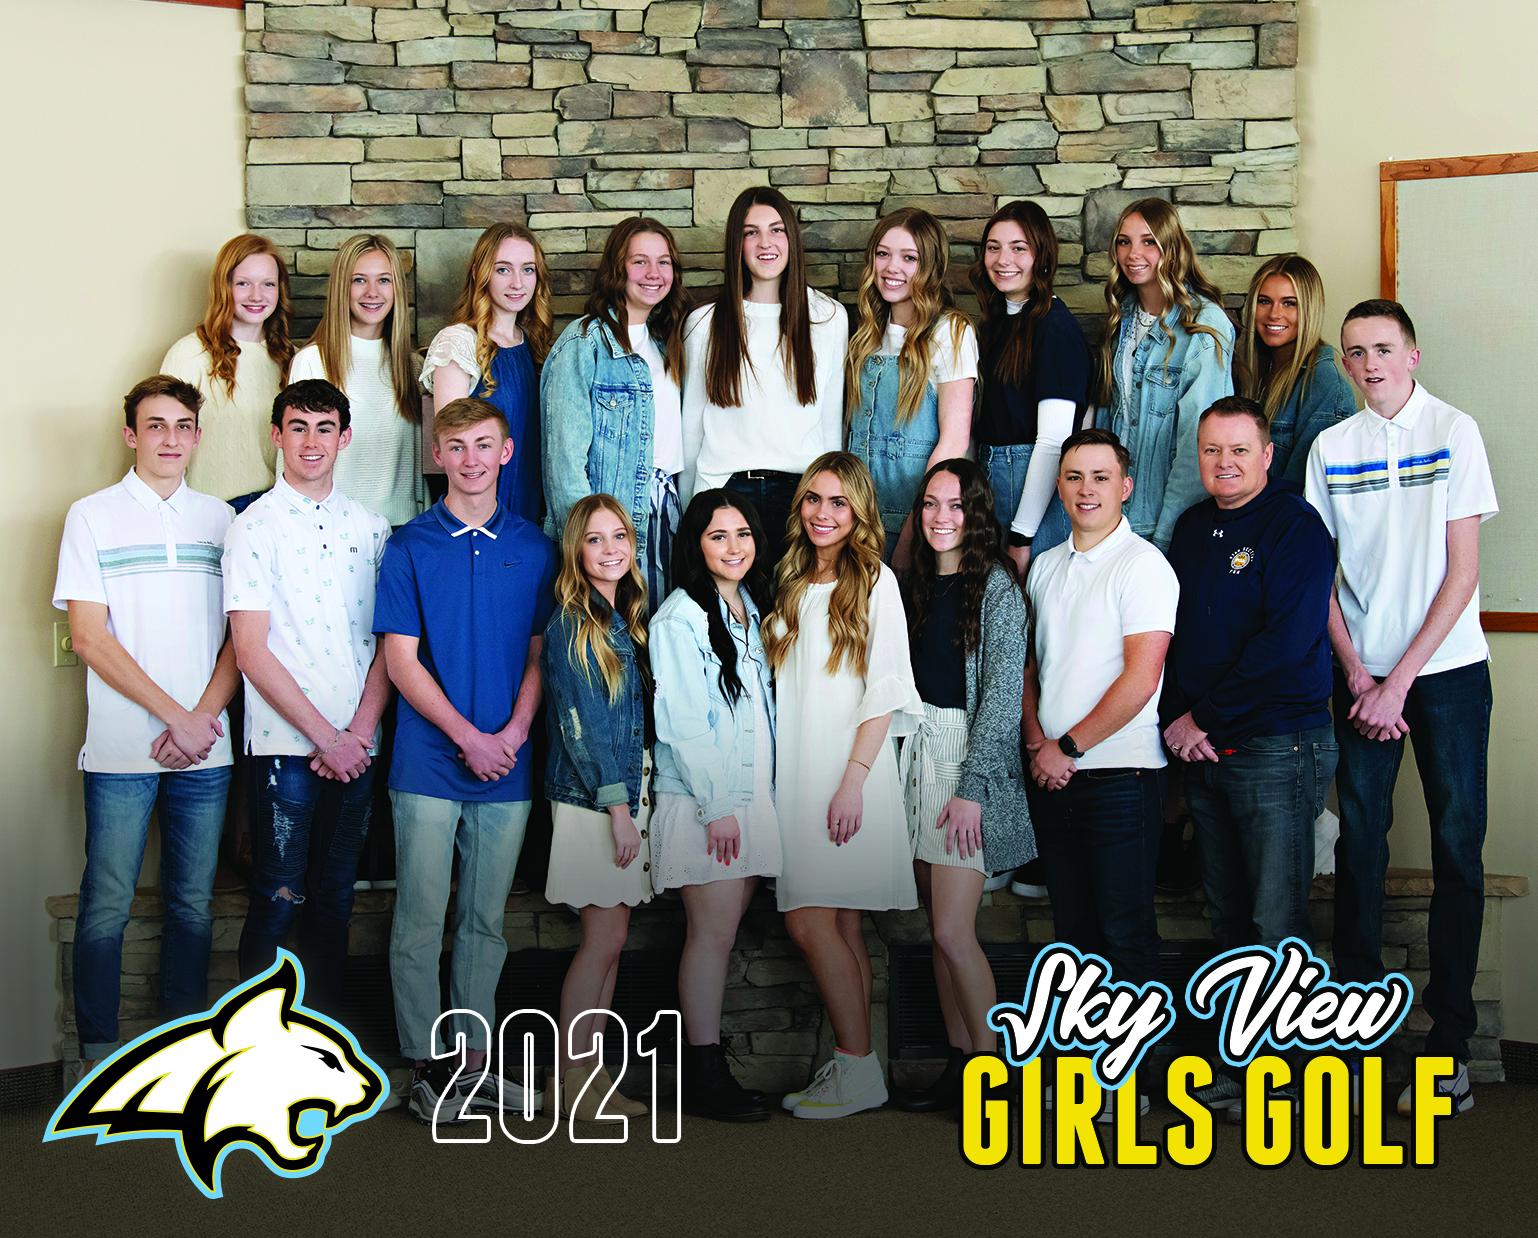 GirlsGolf2021-8x10